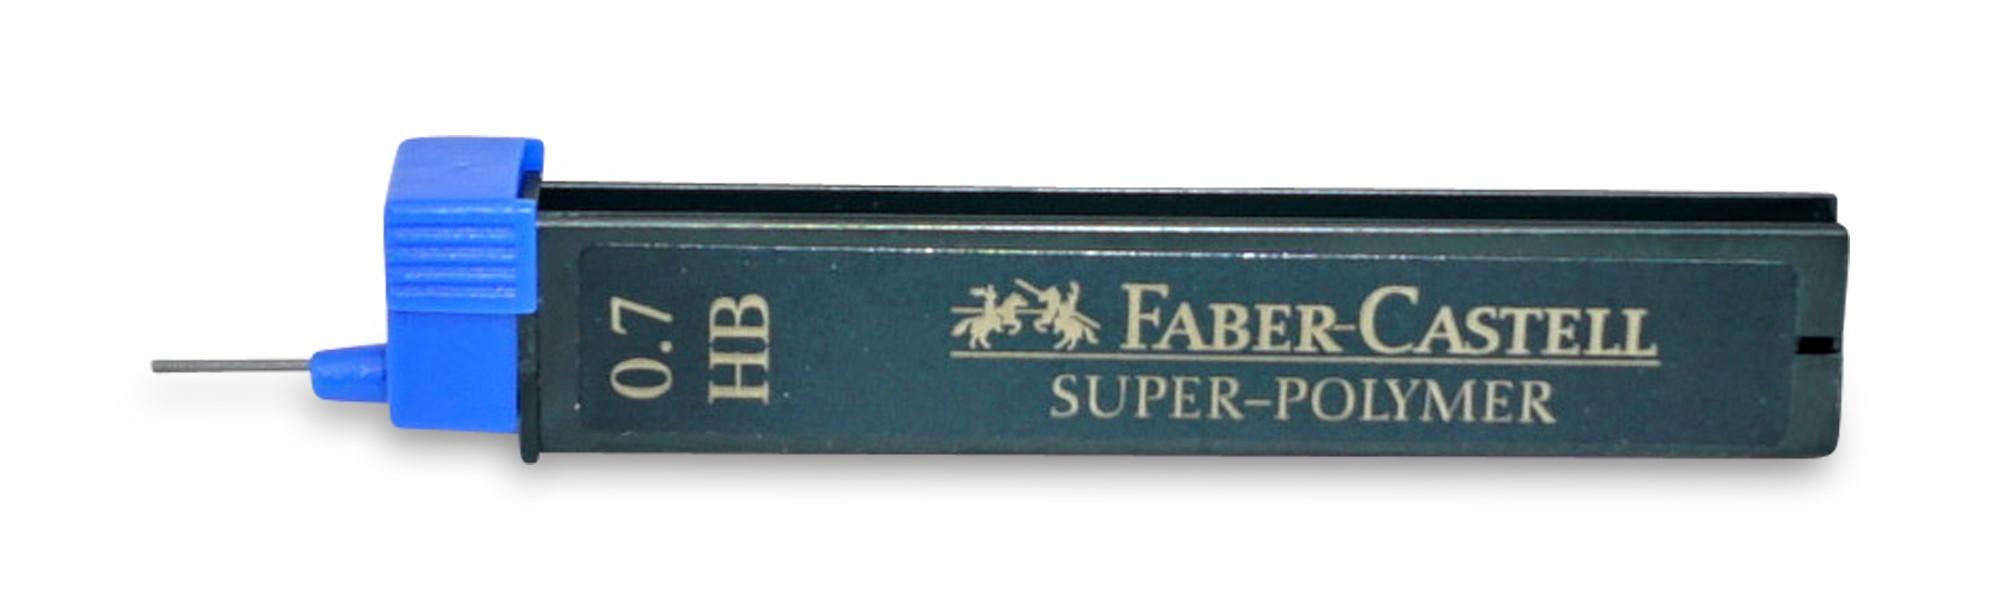 Faber-Castell  Druckbleistiftminen